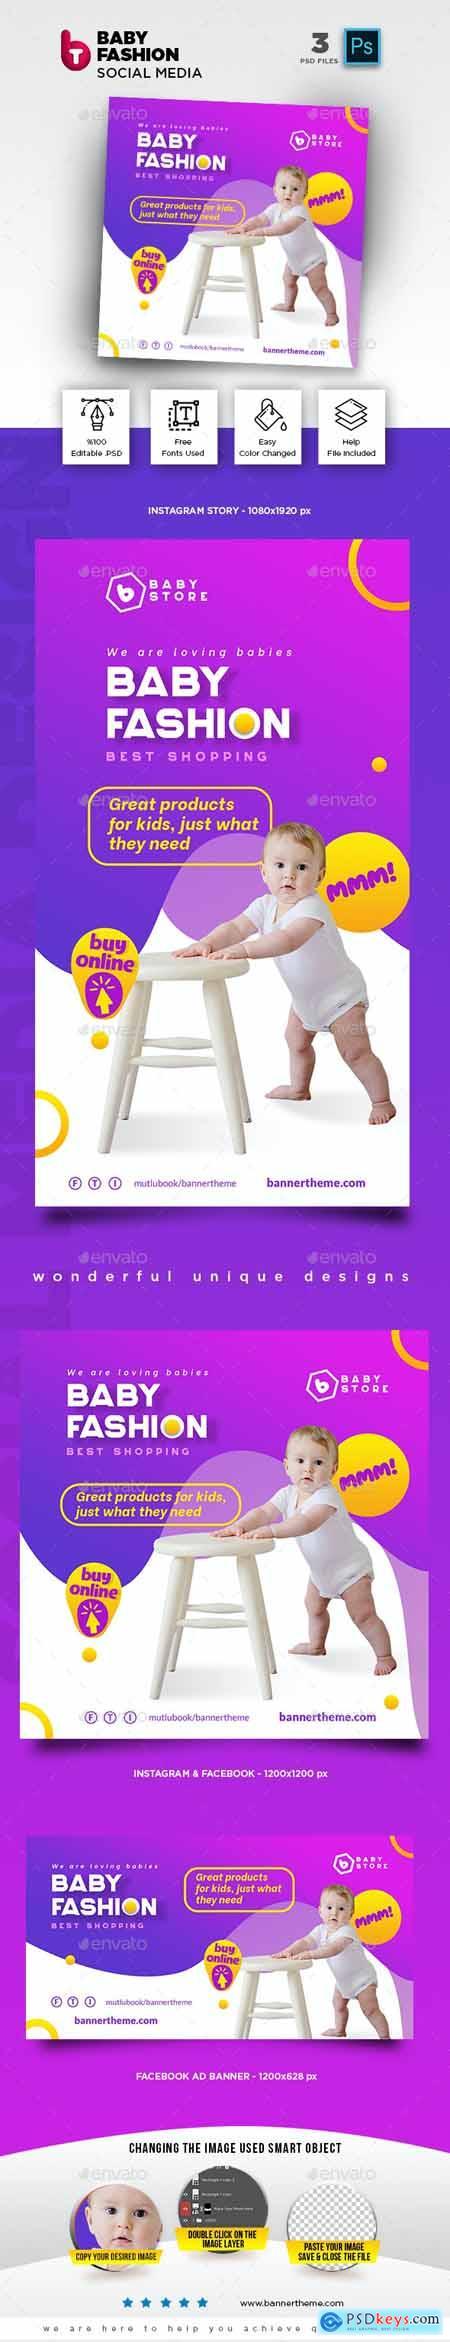 Baby Fashion Social Media Pack 26435839